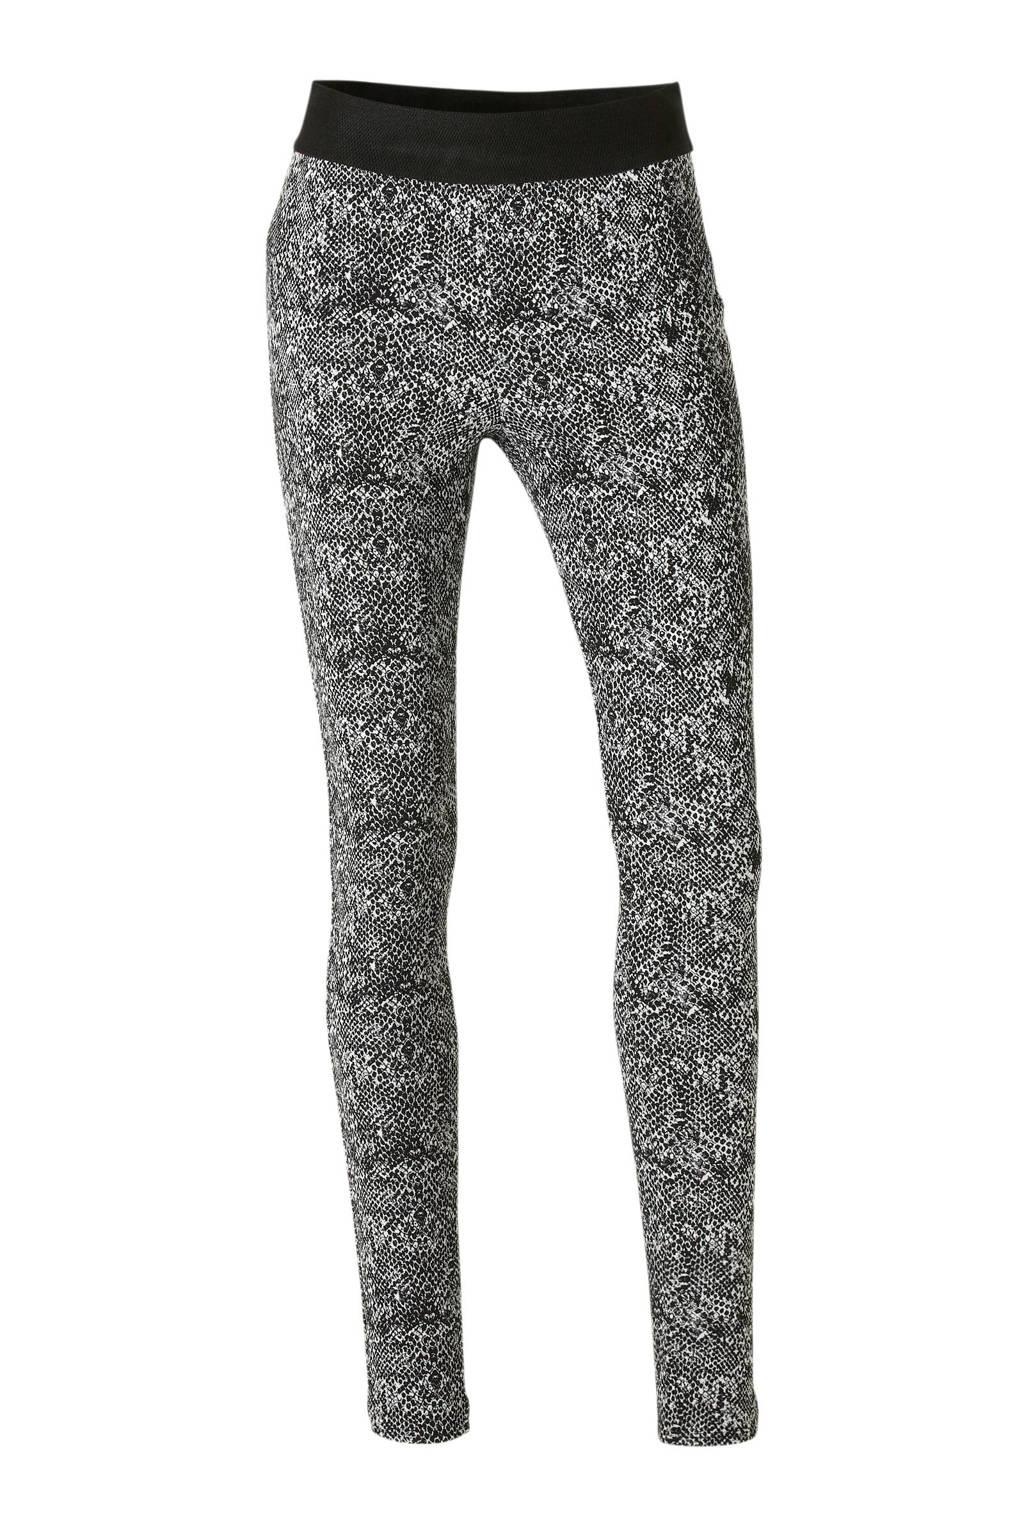 anytime legging in slangeprint zwart/ecru, Zwart/ecru